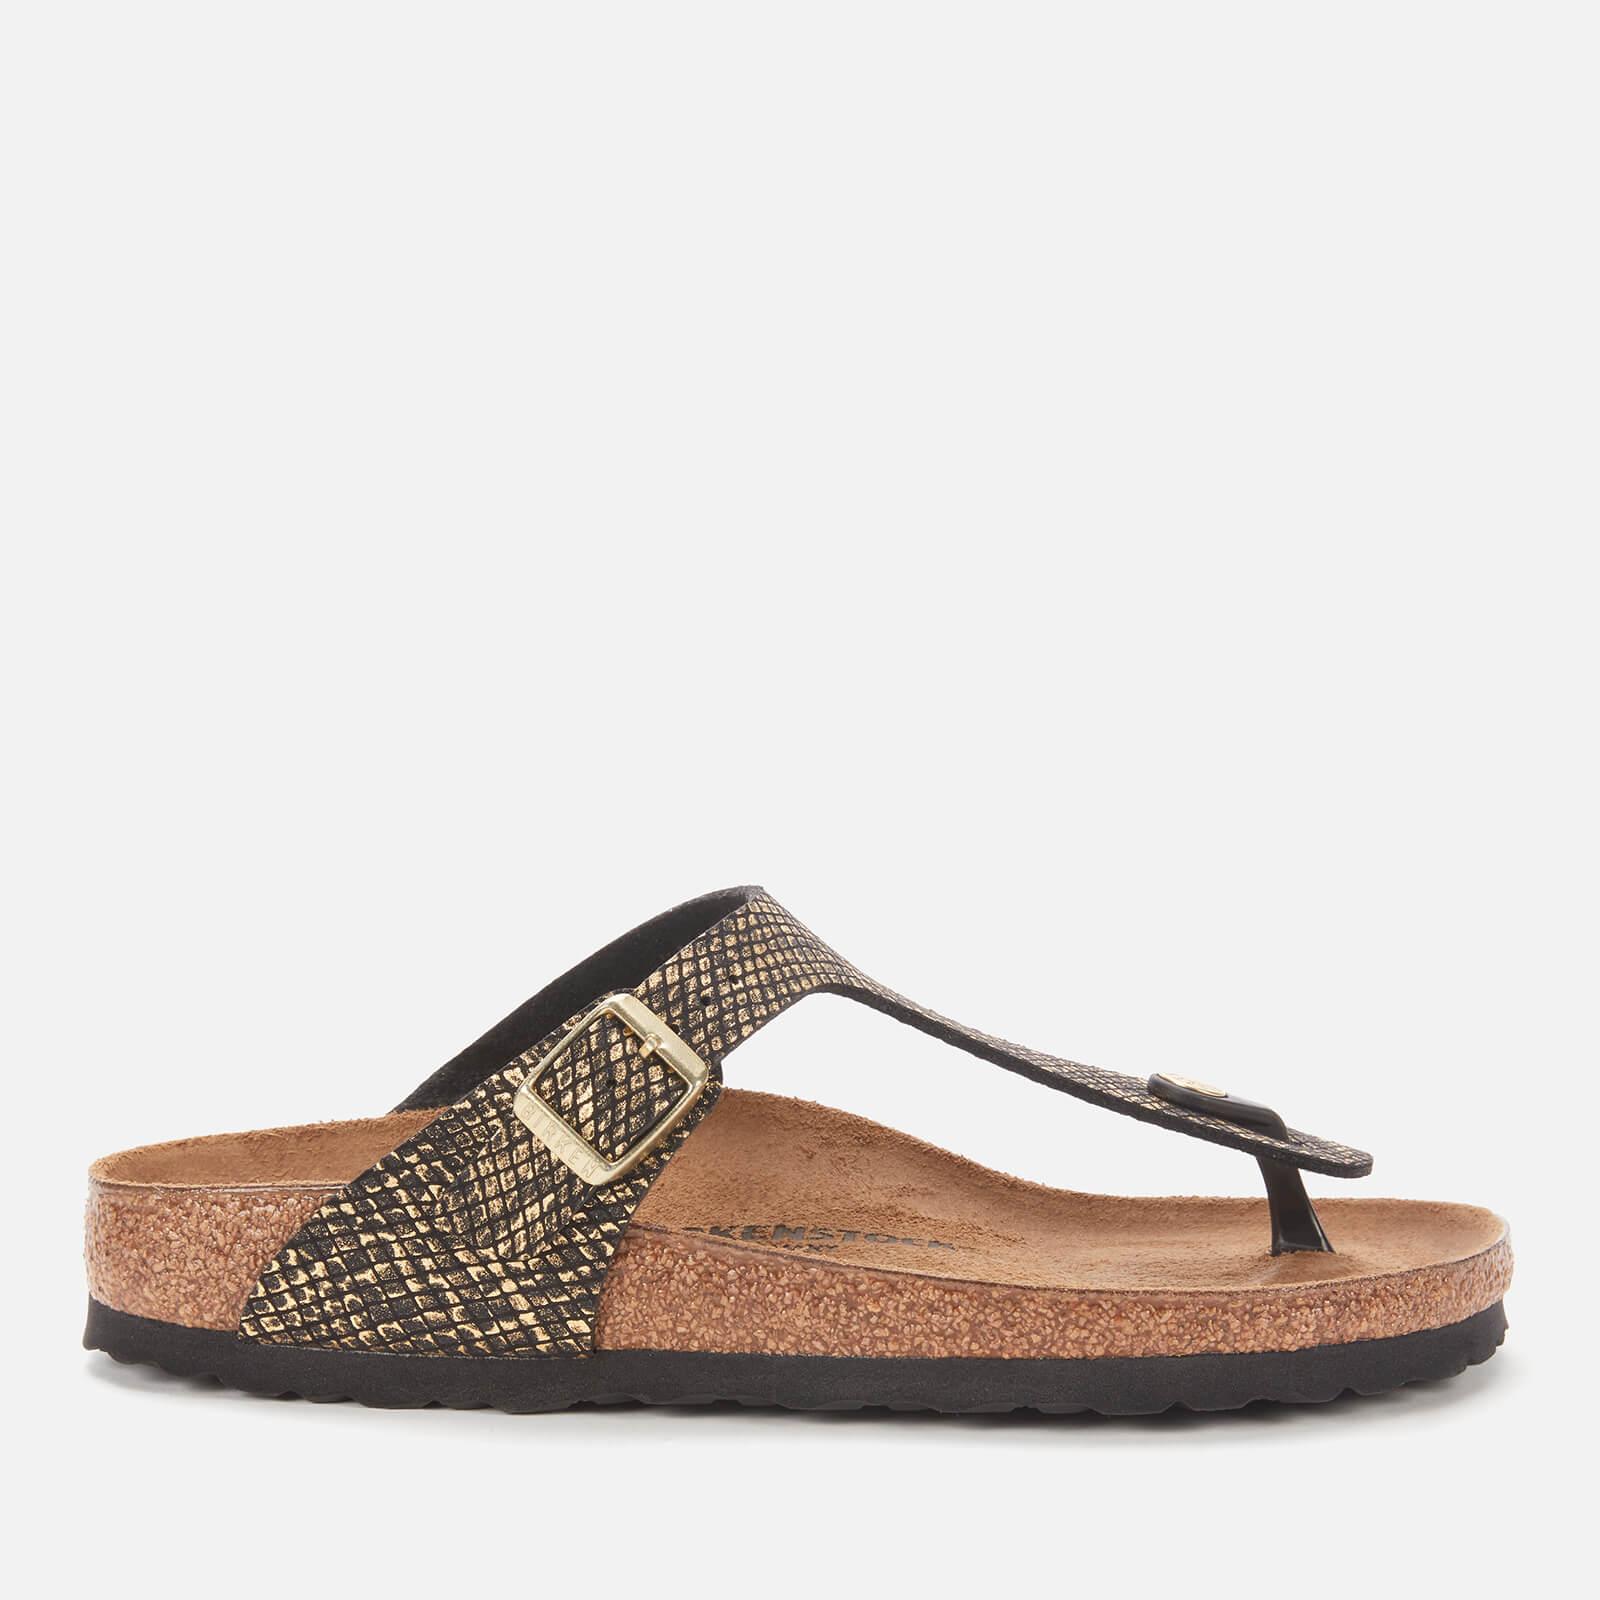 Birkenstock Womens Shiny Python Gizeh Toe Post Sandals Black Gold Eu 36 Uk 35